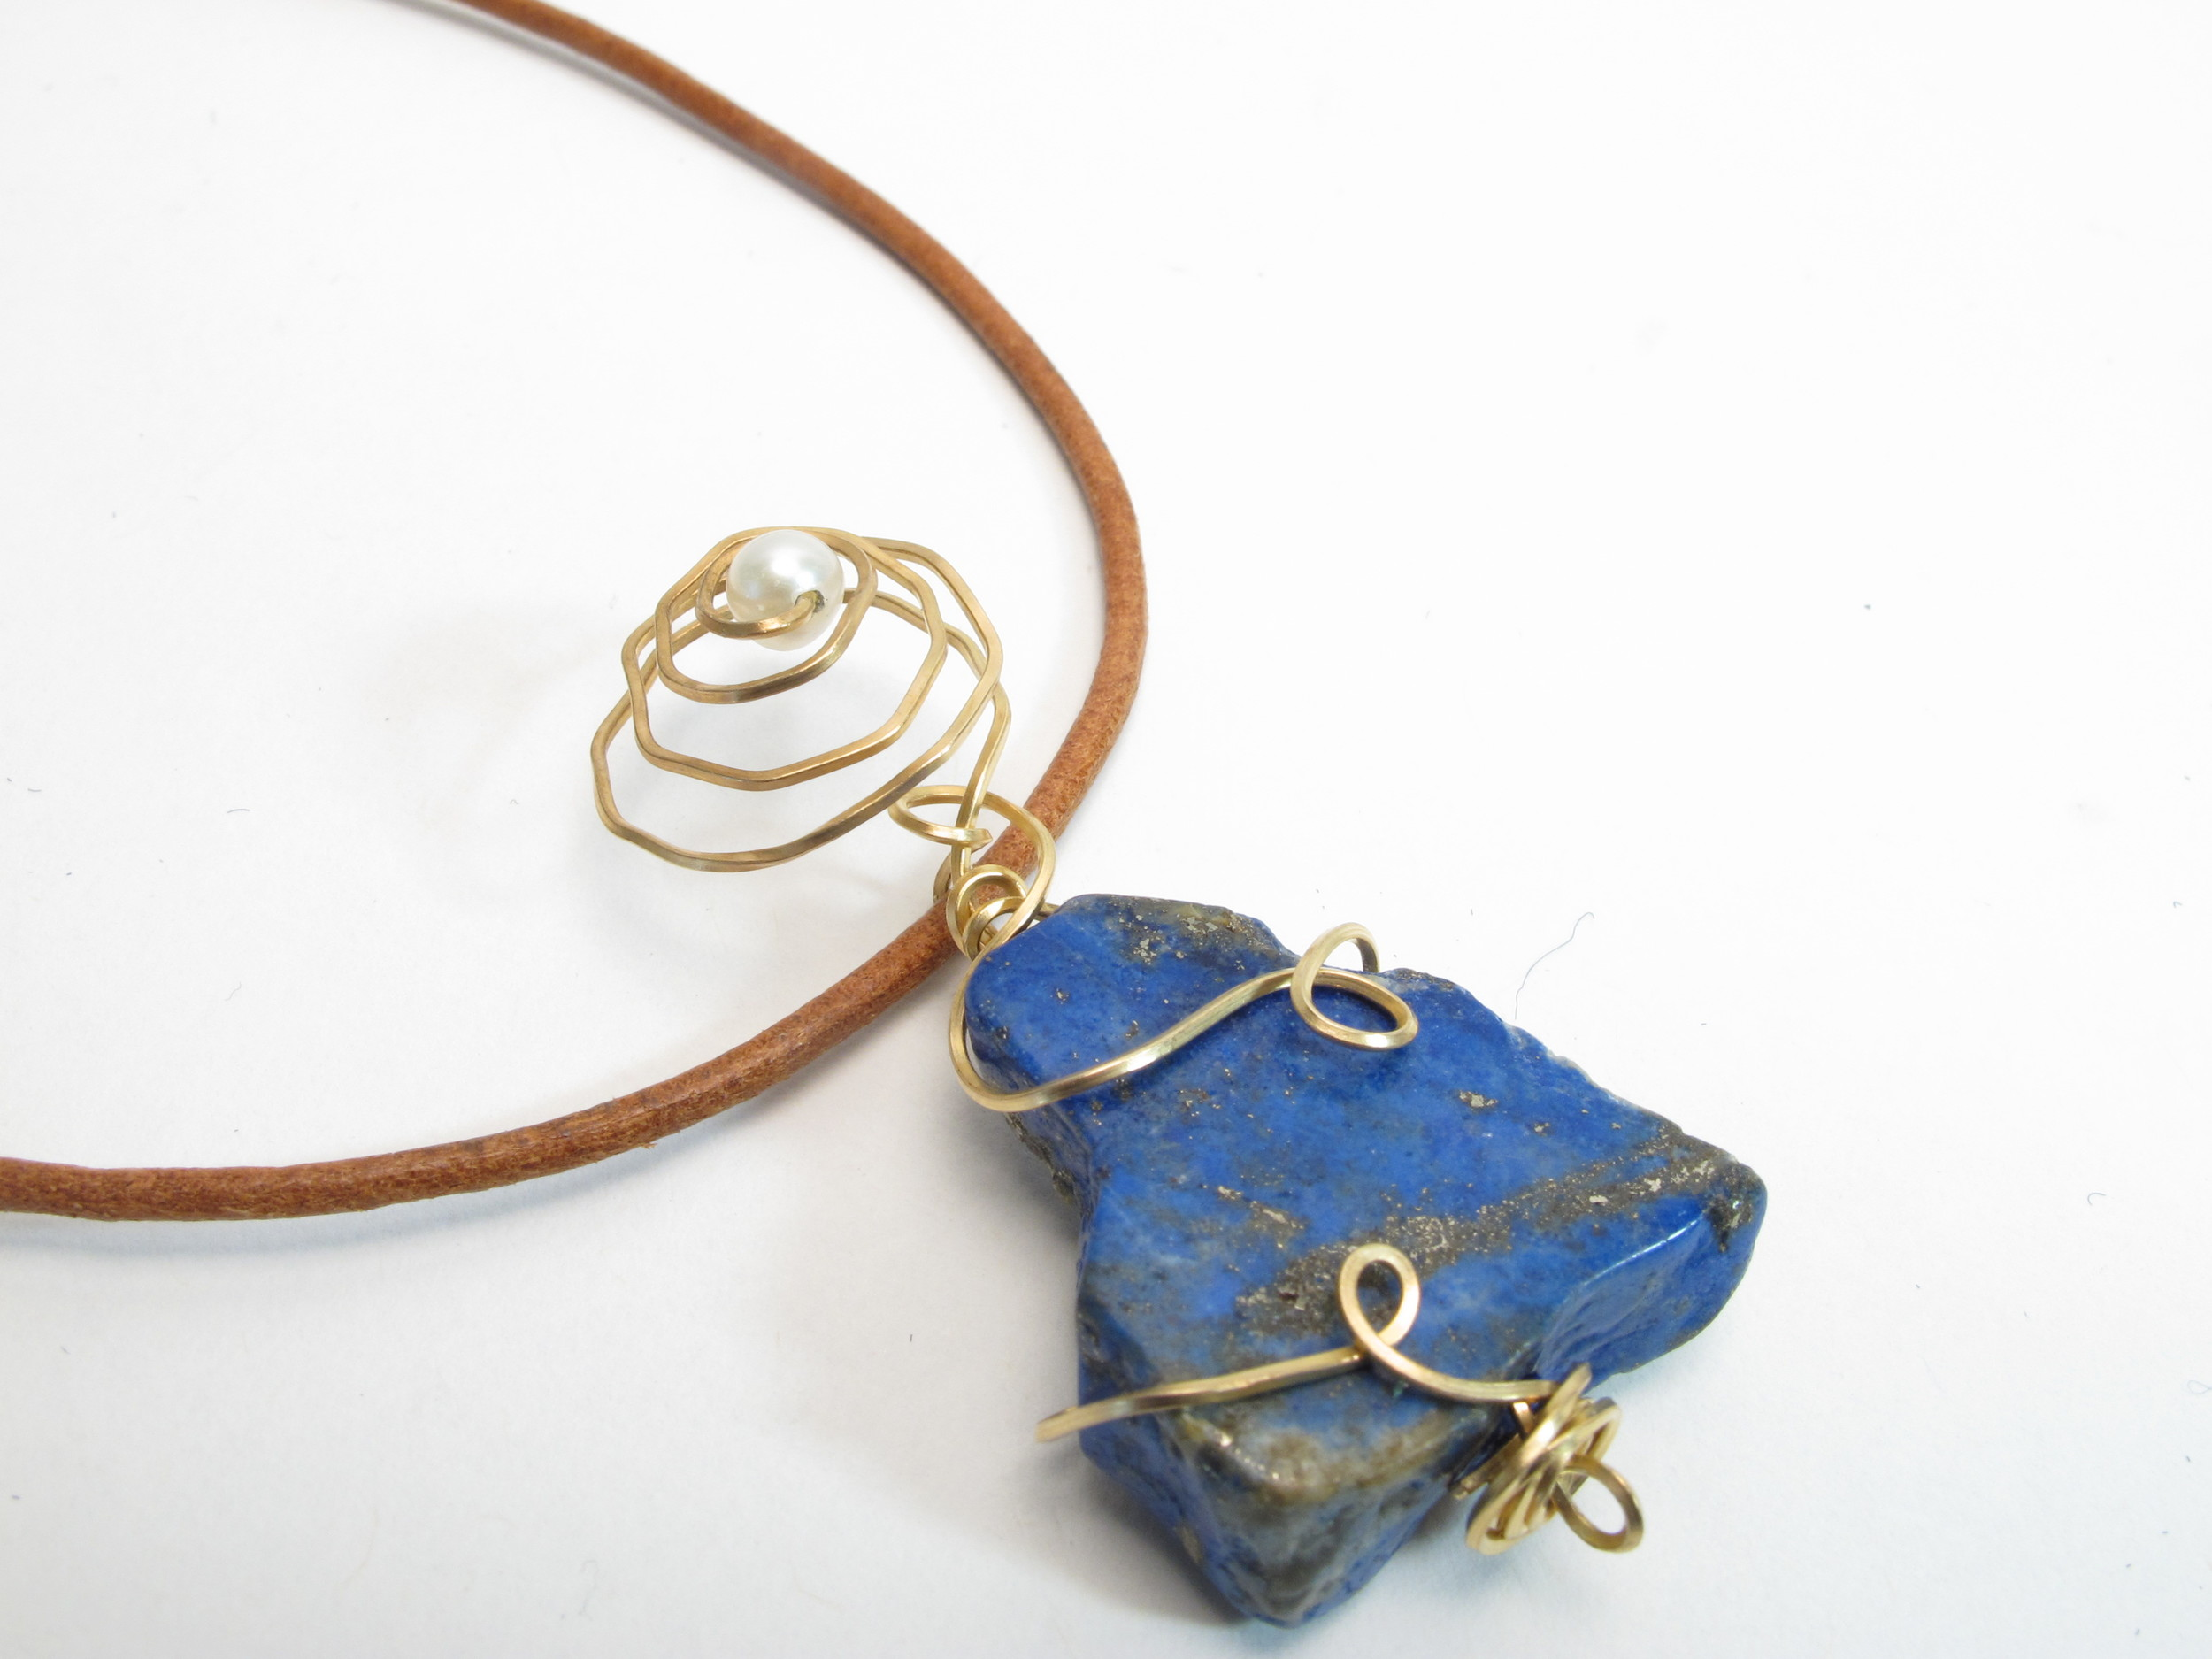 Wire Wrapped & Wire Crochet Jewelry